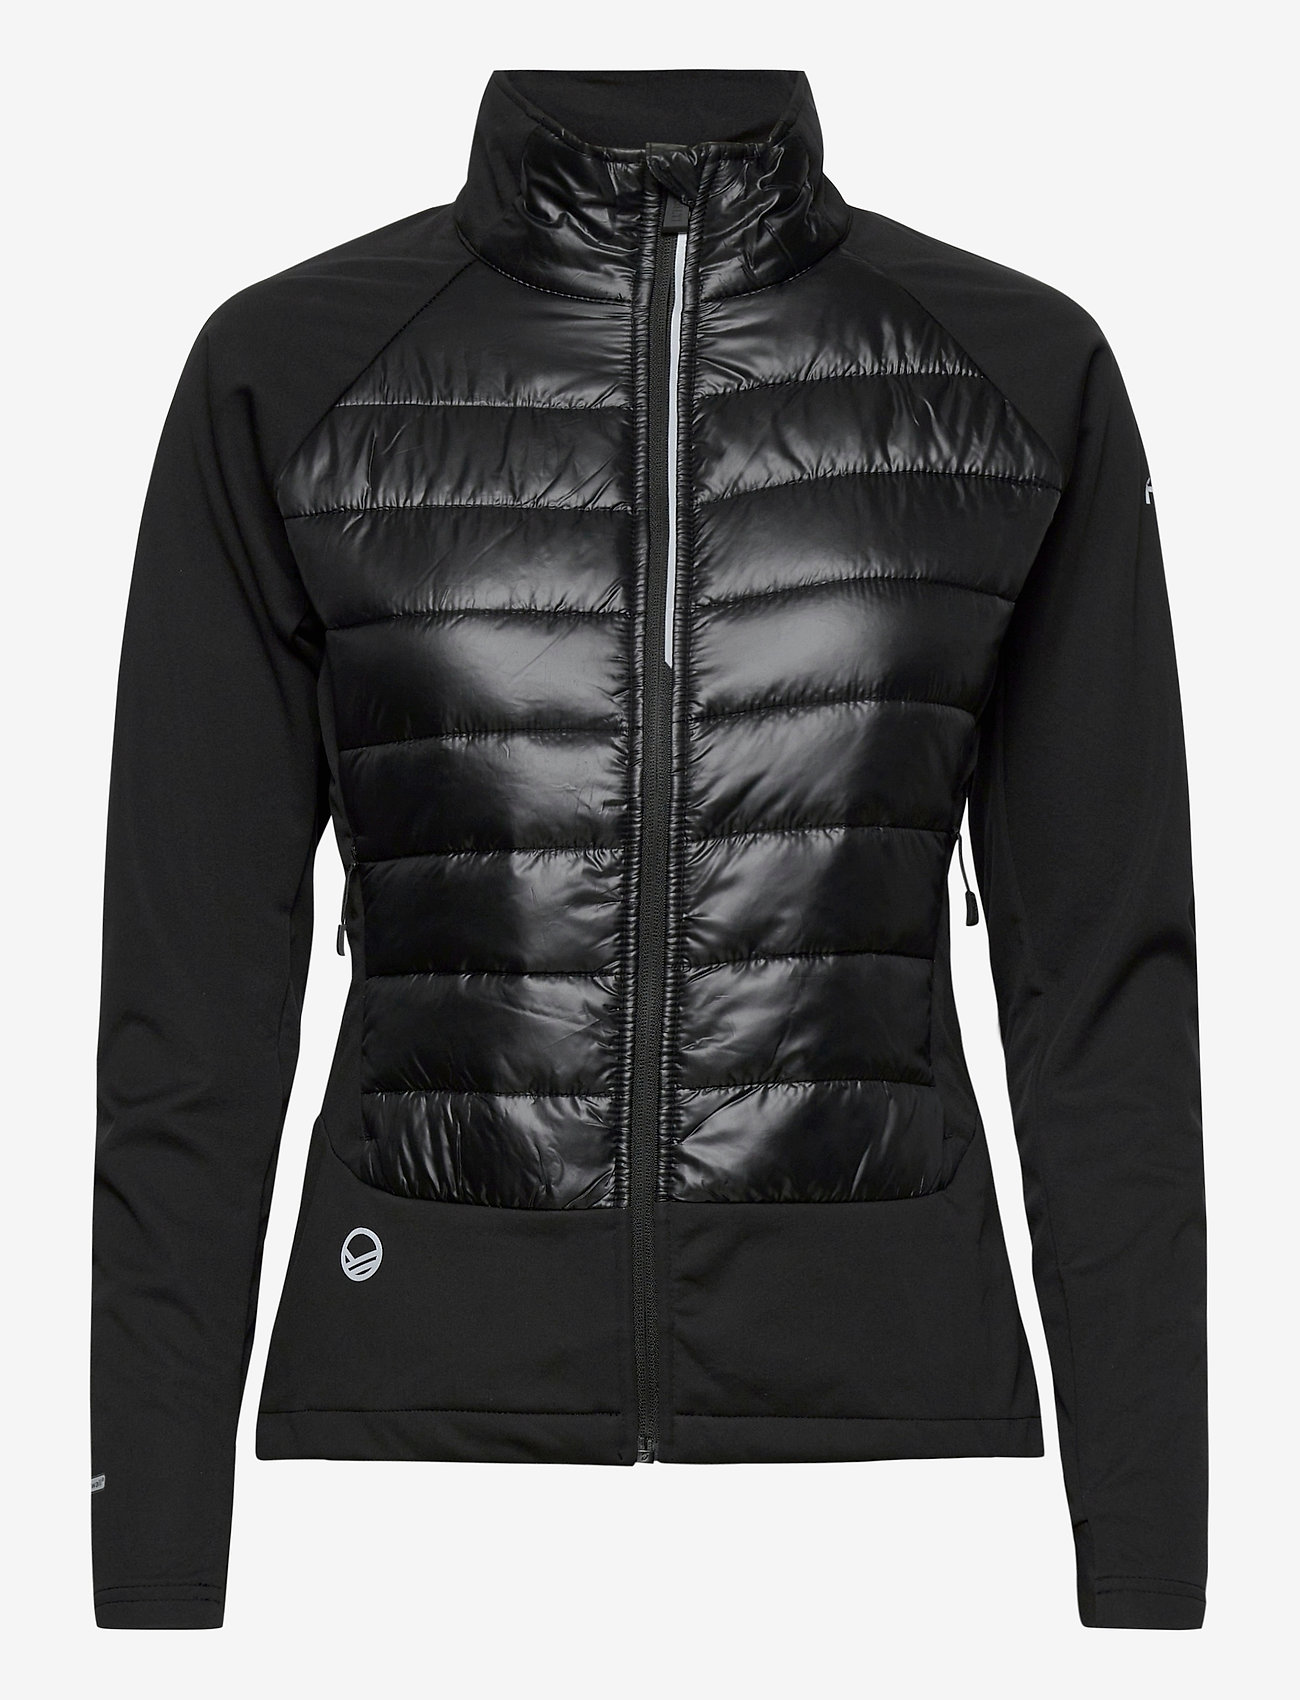 Halti - Olos Women's Hybrid Cross Country Ski Jacket - laskettelutakki - black - 1